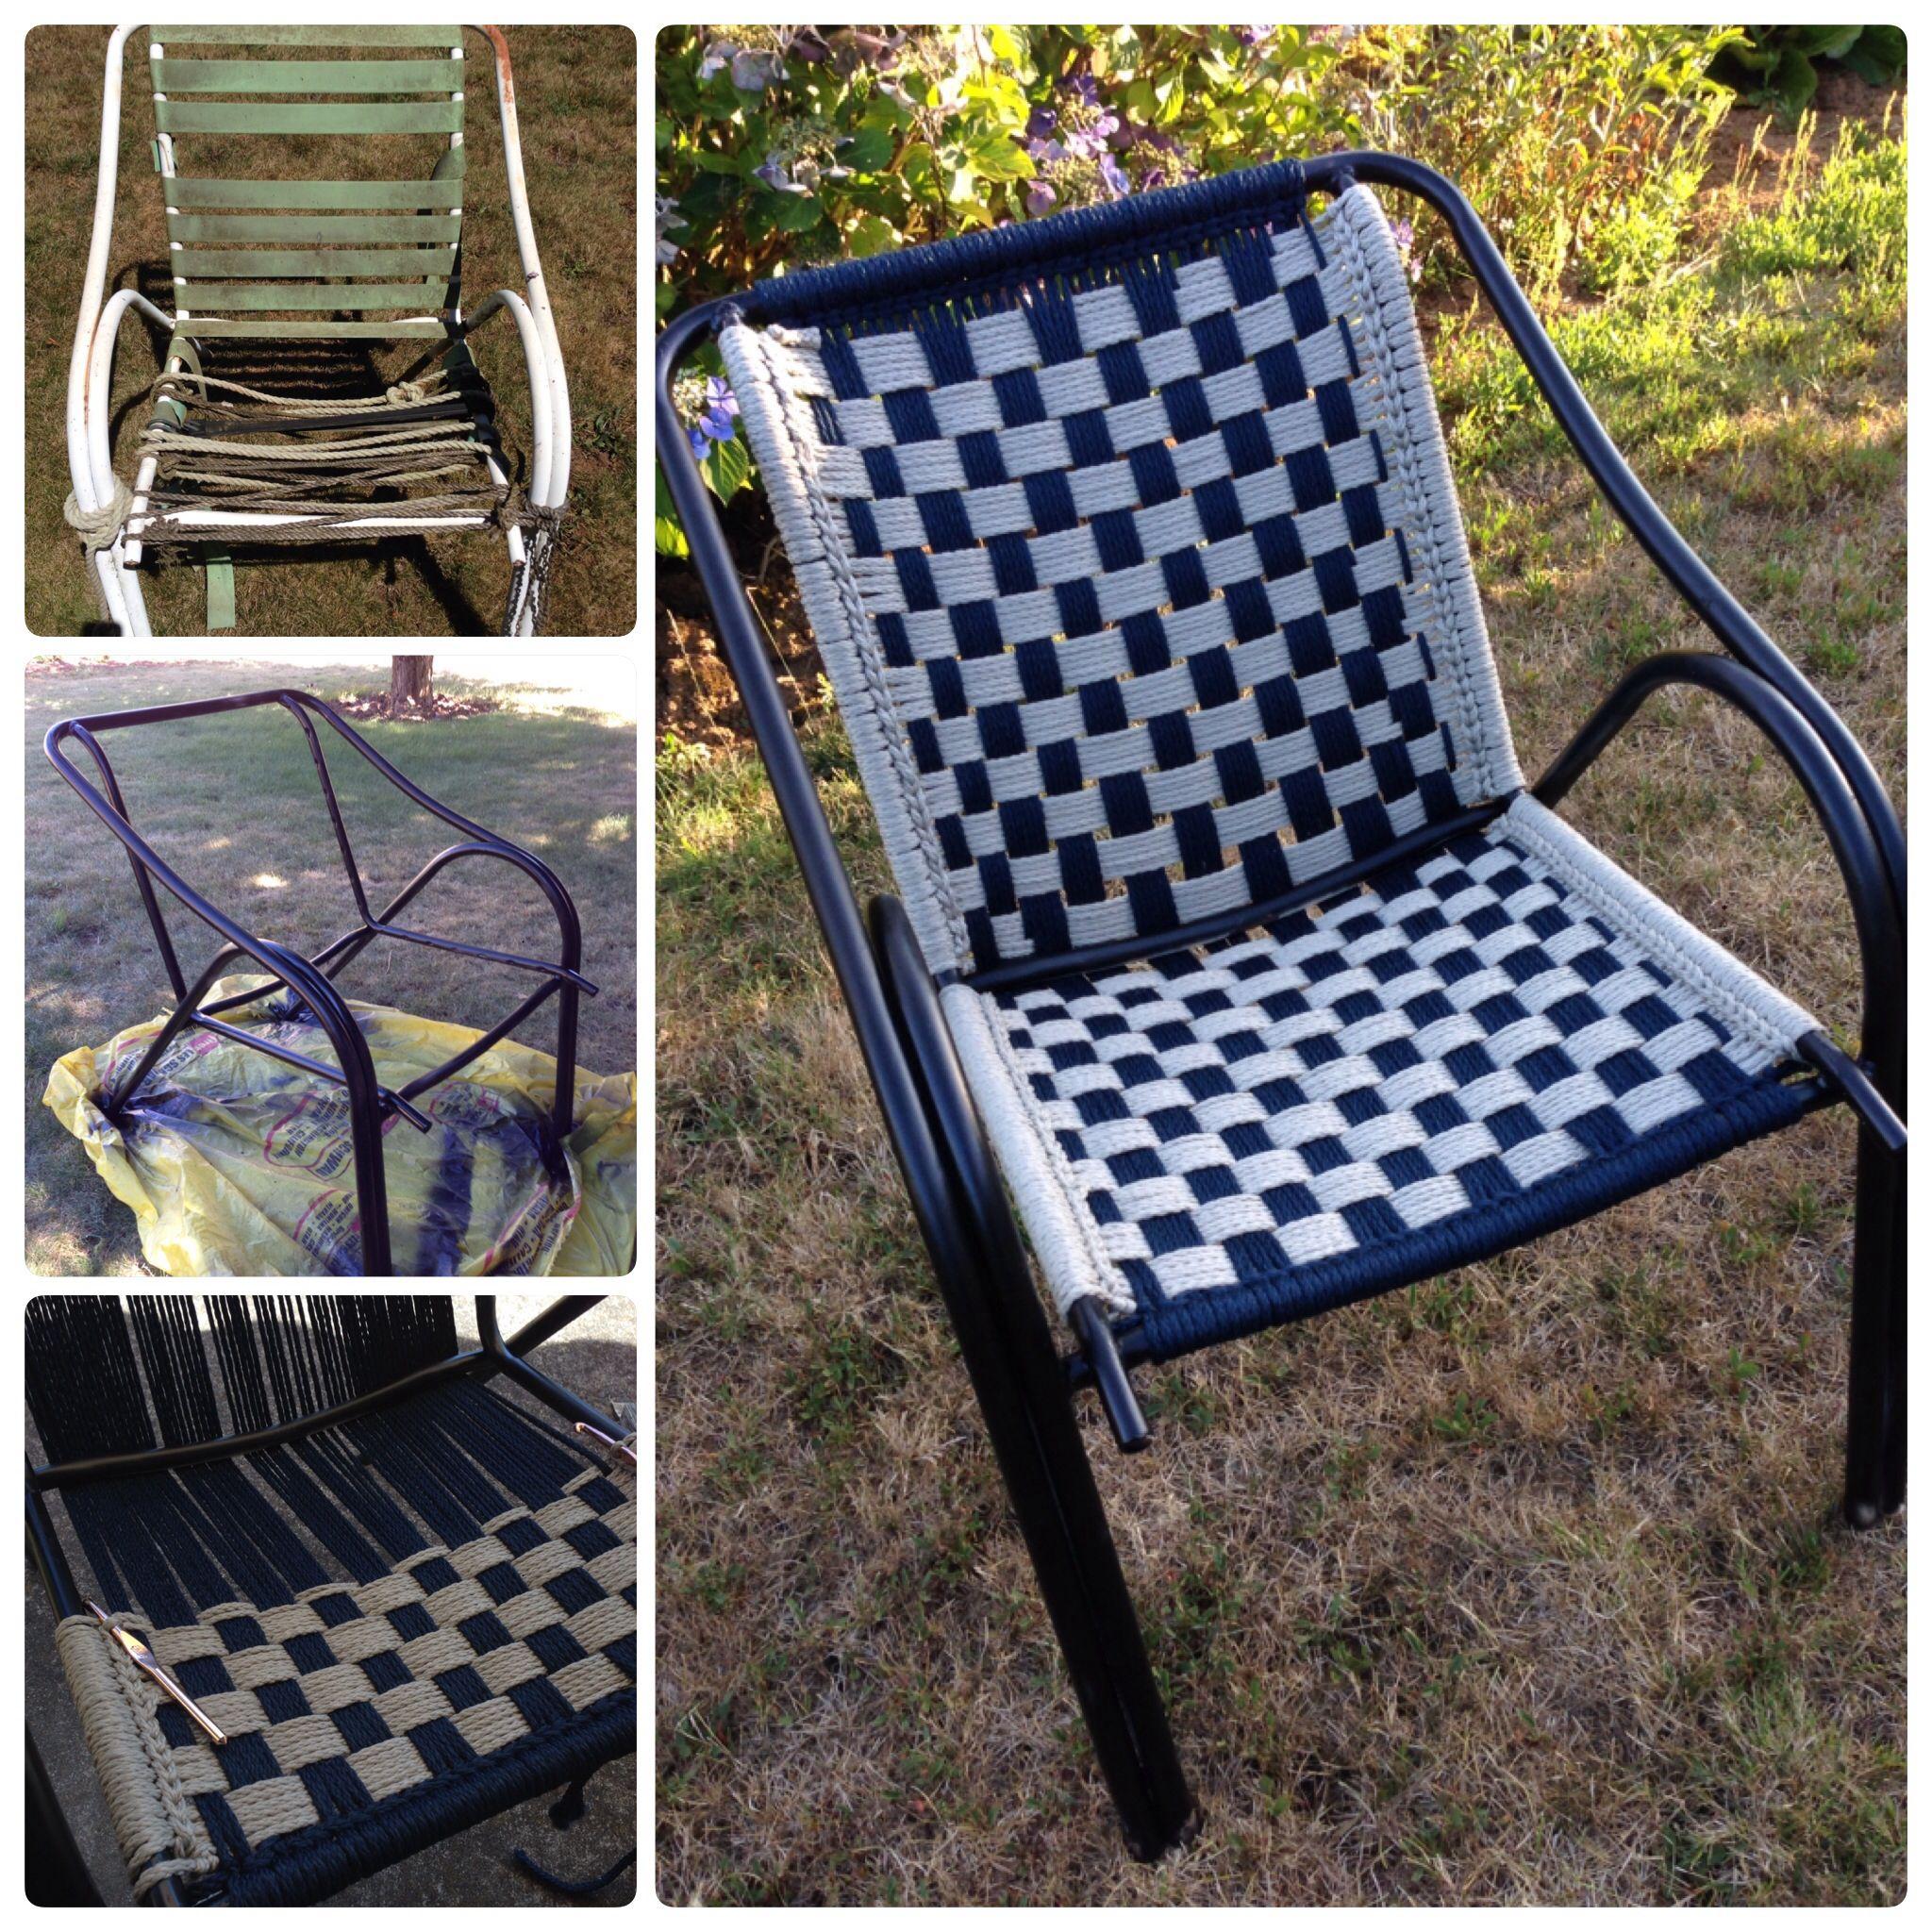 Macrame Lawn Chair Ideas For The House Macrame